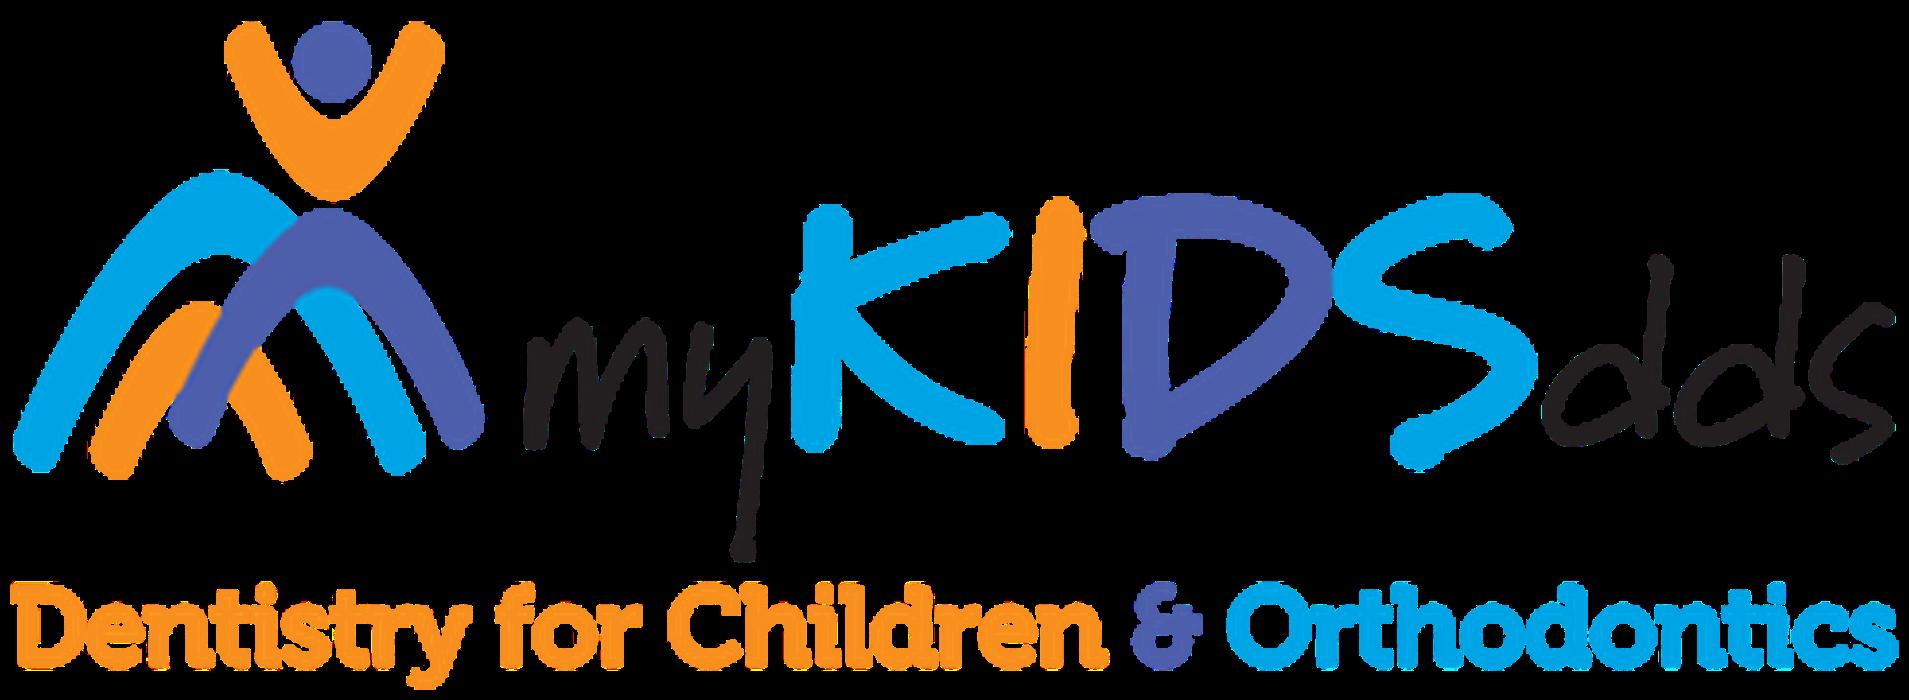 myKIDSdds Dentistry for Children & Orthodontics - Dallas, TX